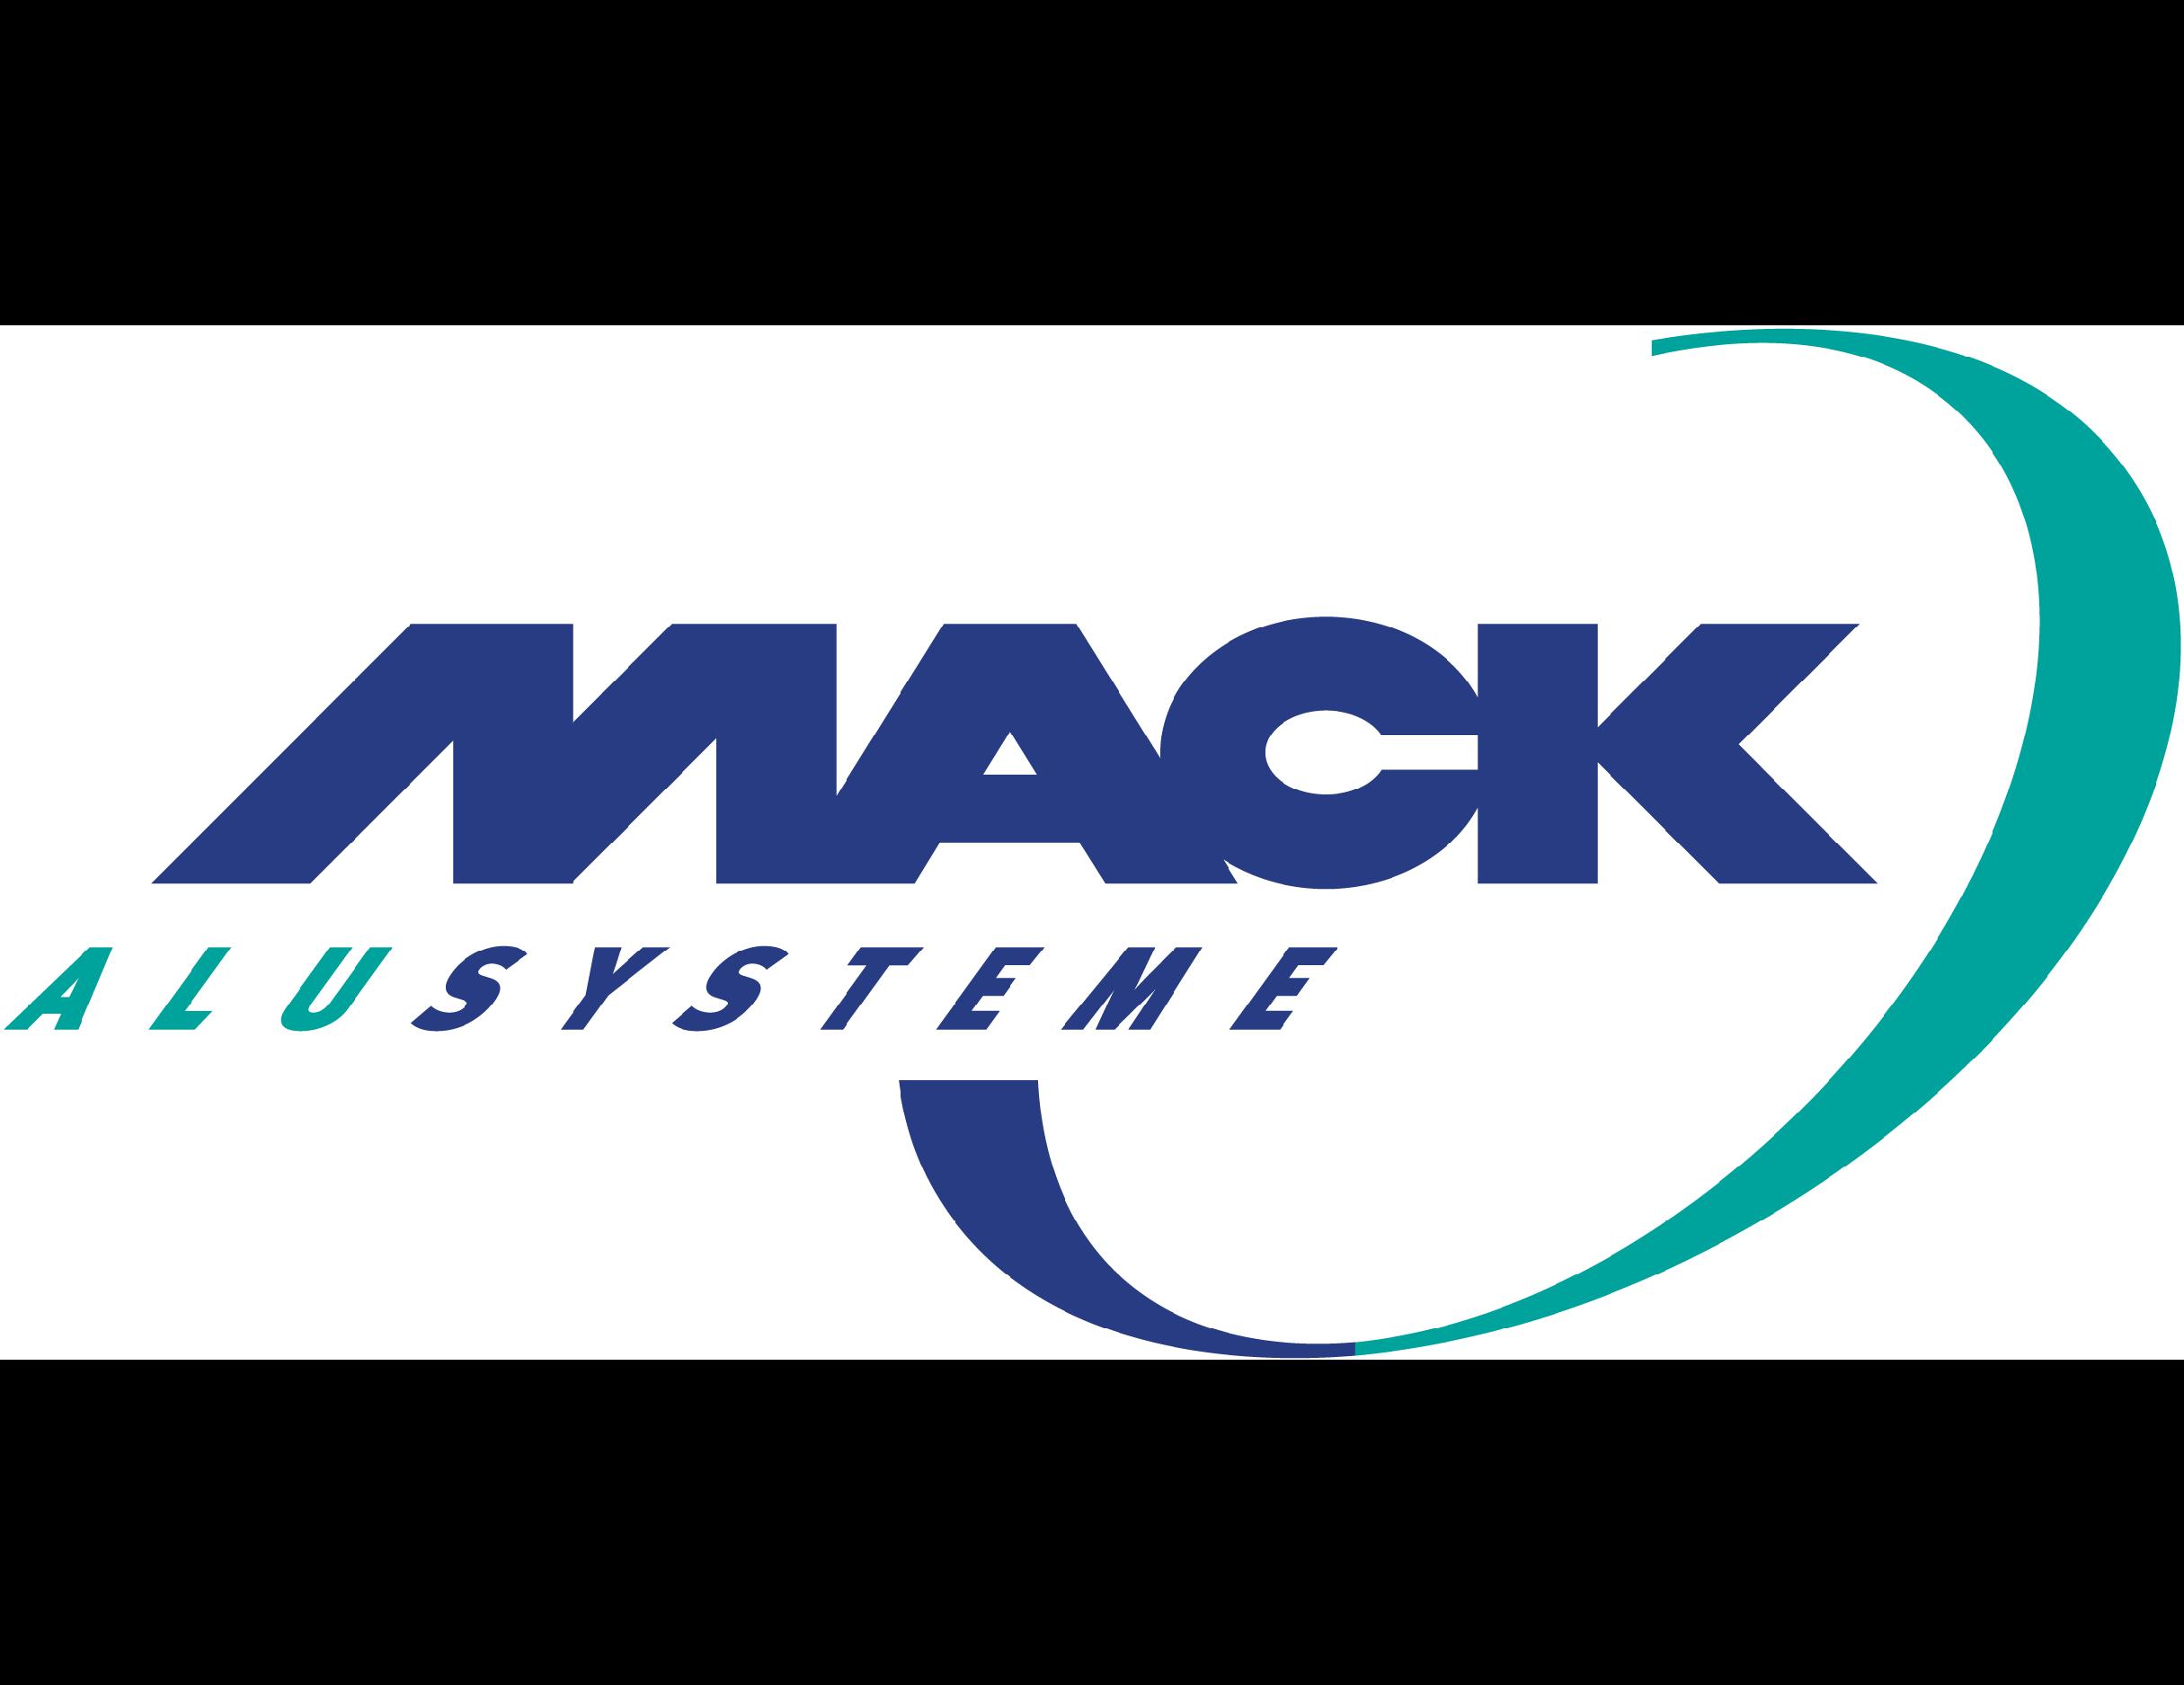 Mack Alu-Systeme Logo.eps999